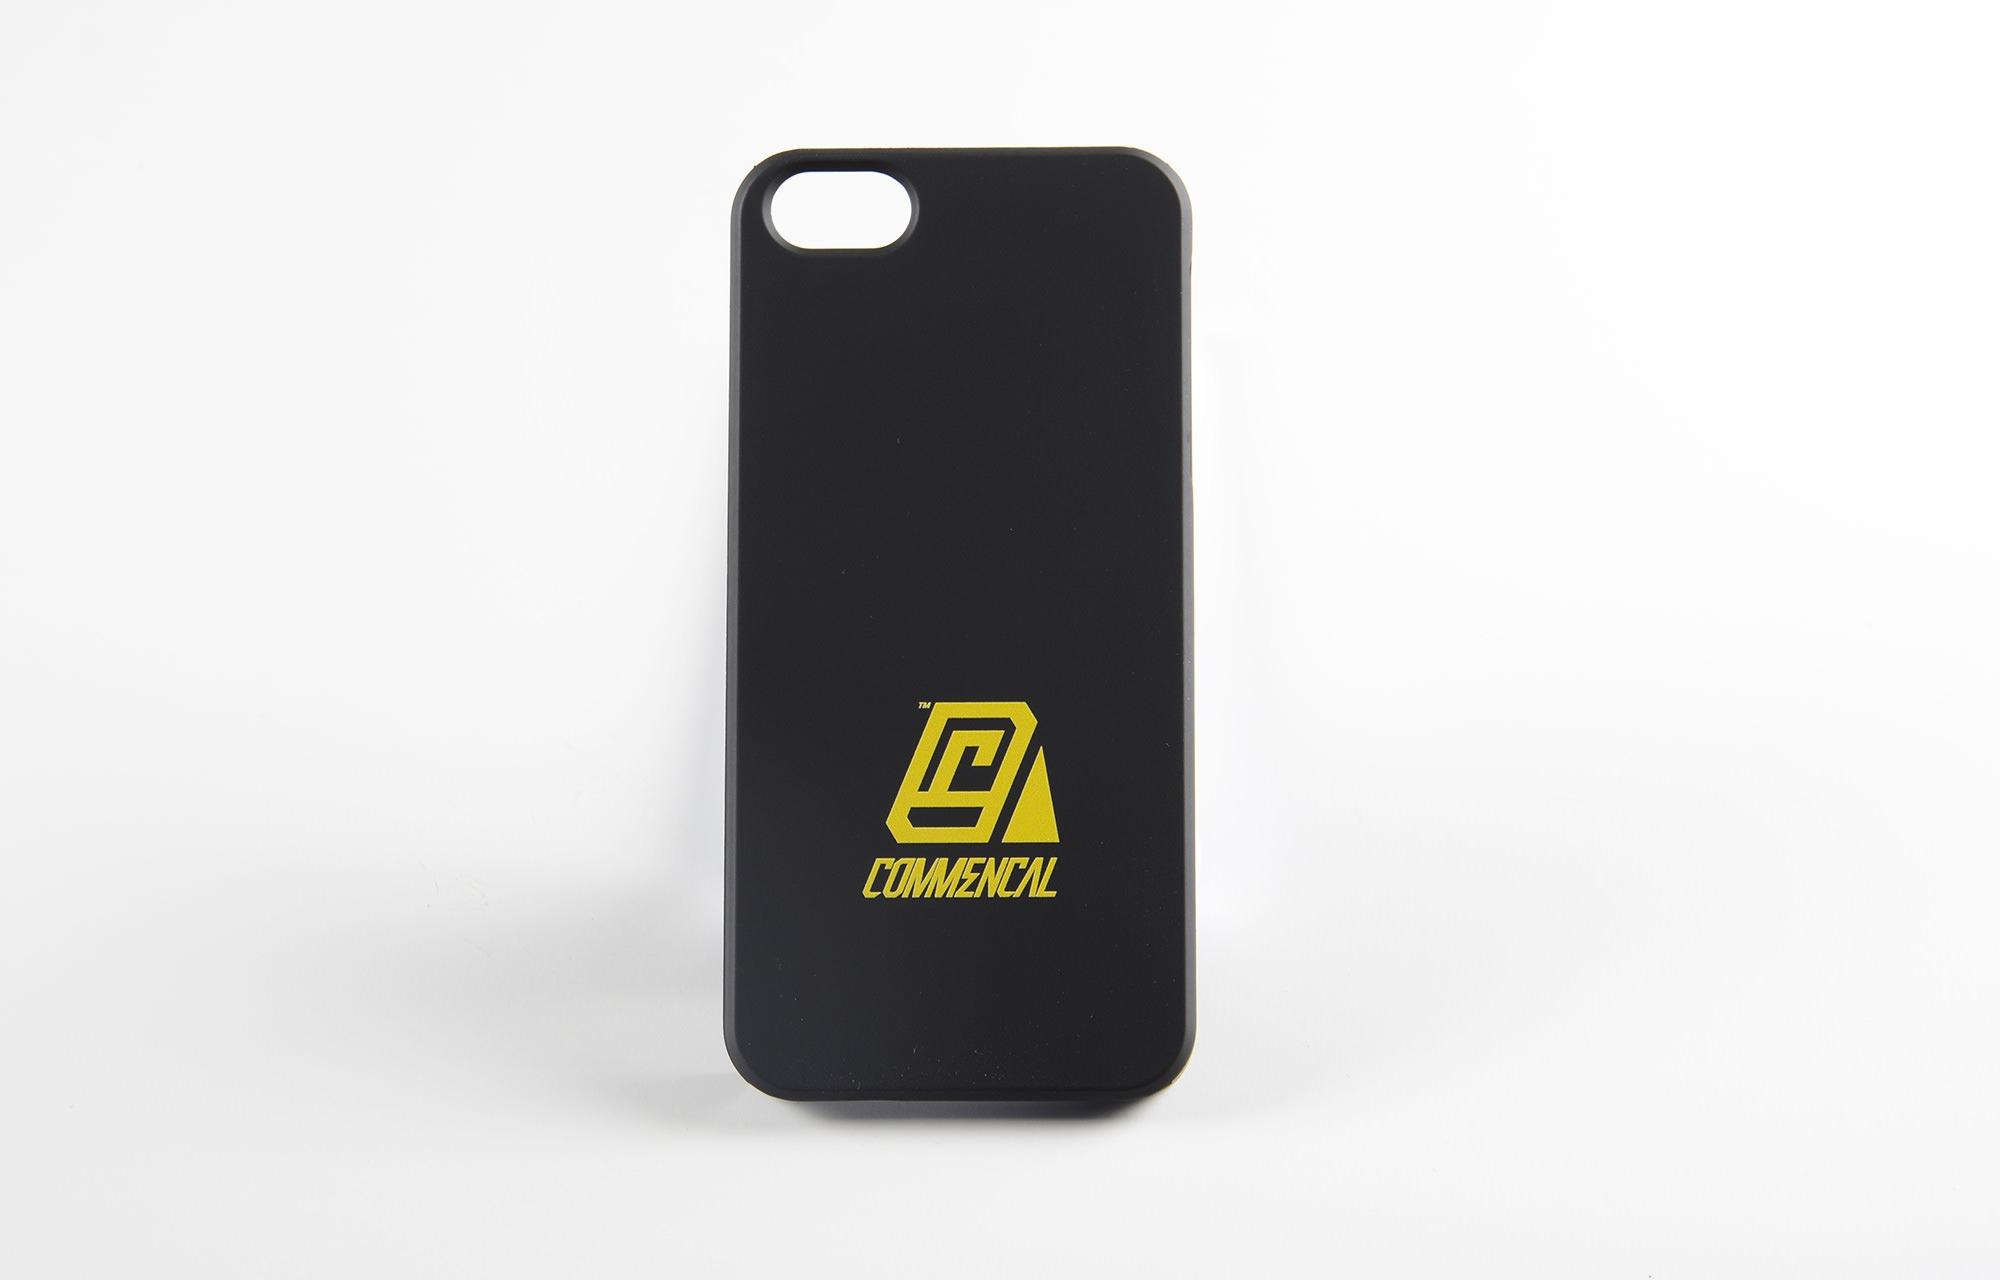 Commencal Iphone 5 5s Case Logo 2016 Iphine